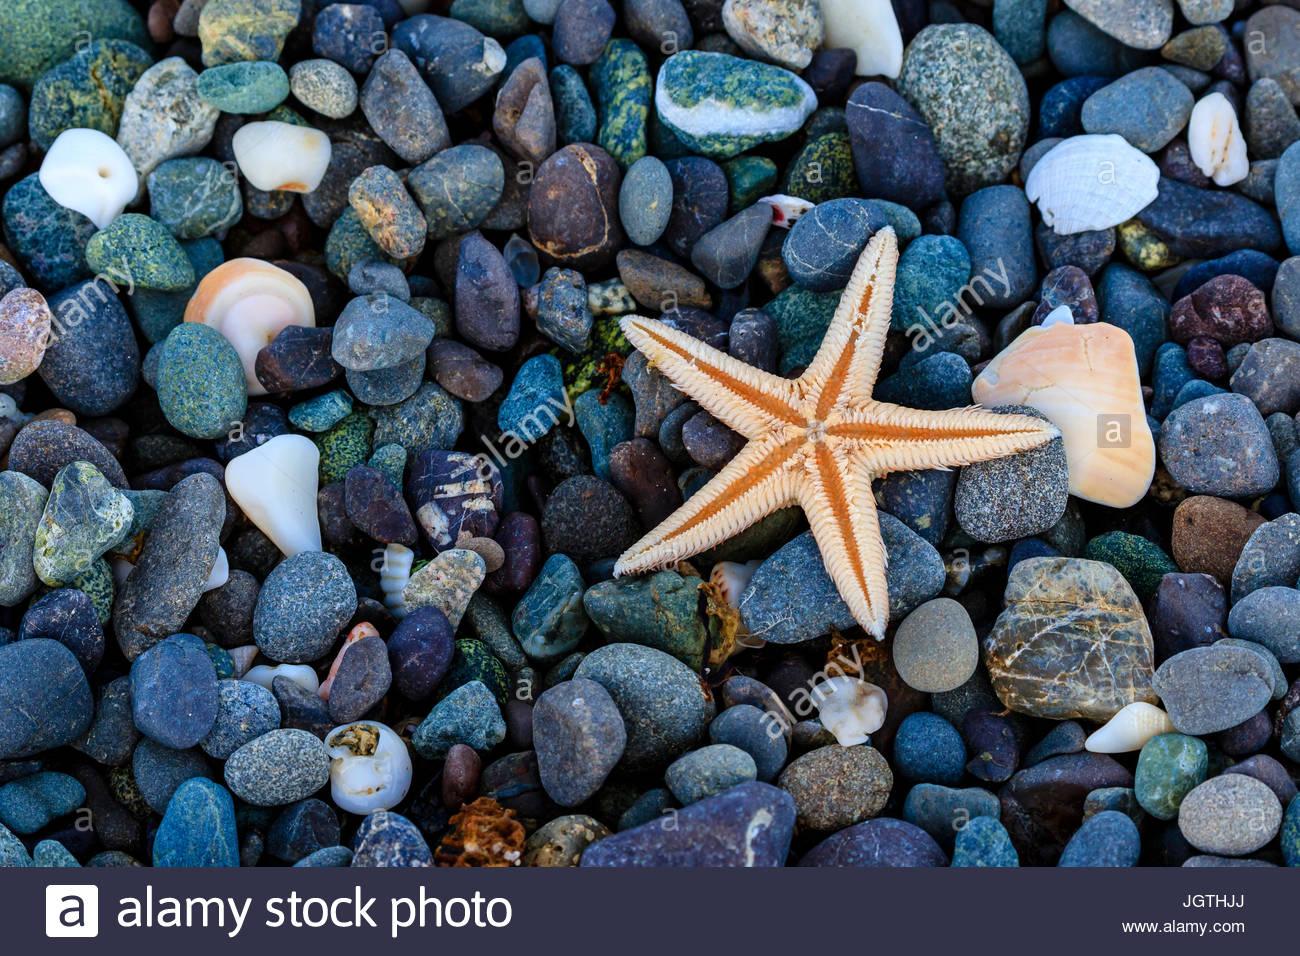 Sea star on colorful beach rocks. - Stock Image